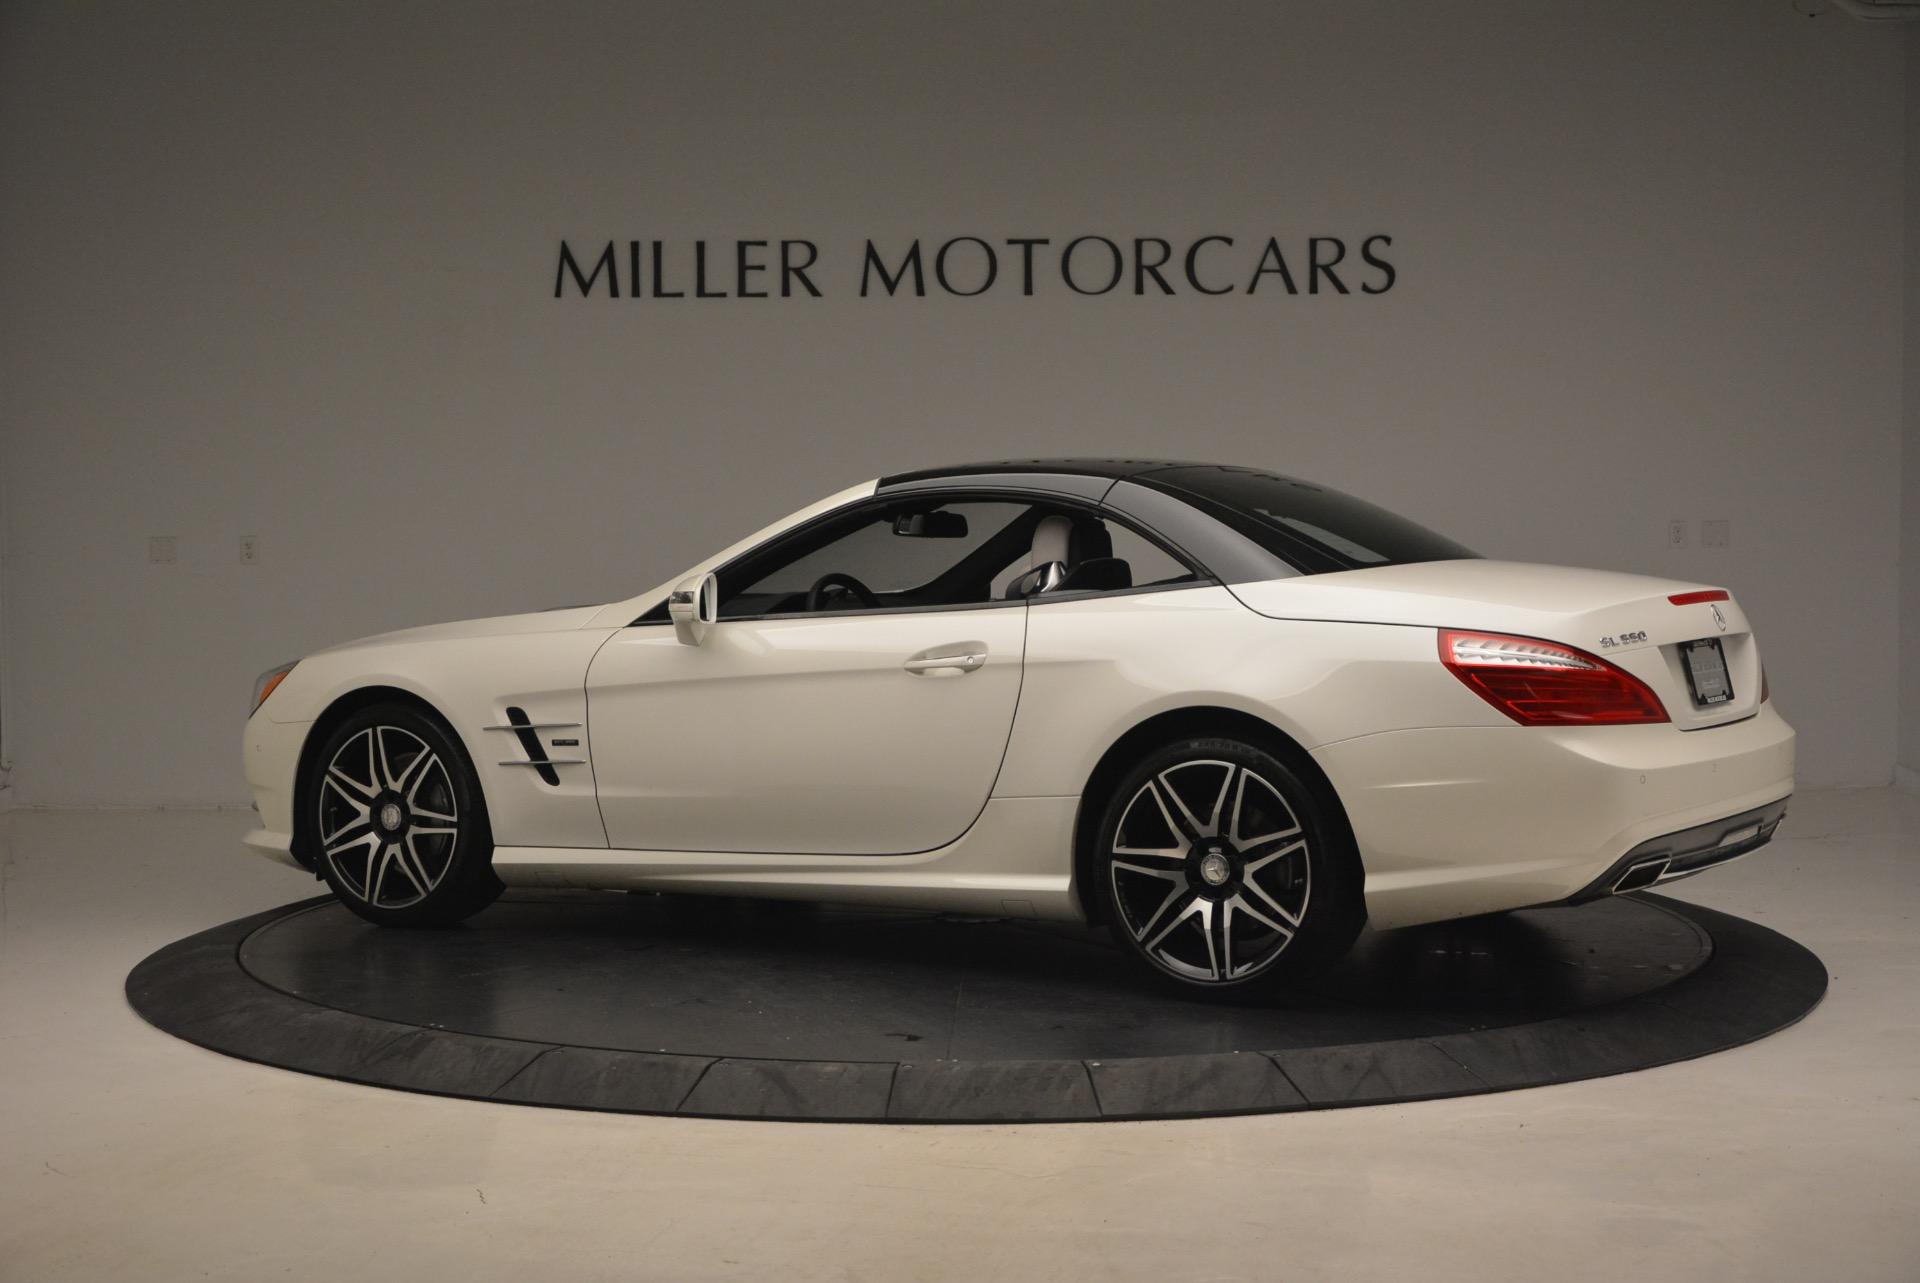 Used 2015 Mercedes Benz SL-Class SL 550 For Sale In Greenwich, CT. Alfa Romeo of Greenwich, M1874A 1261_p18